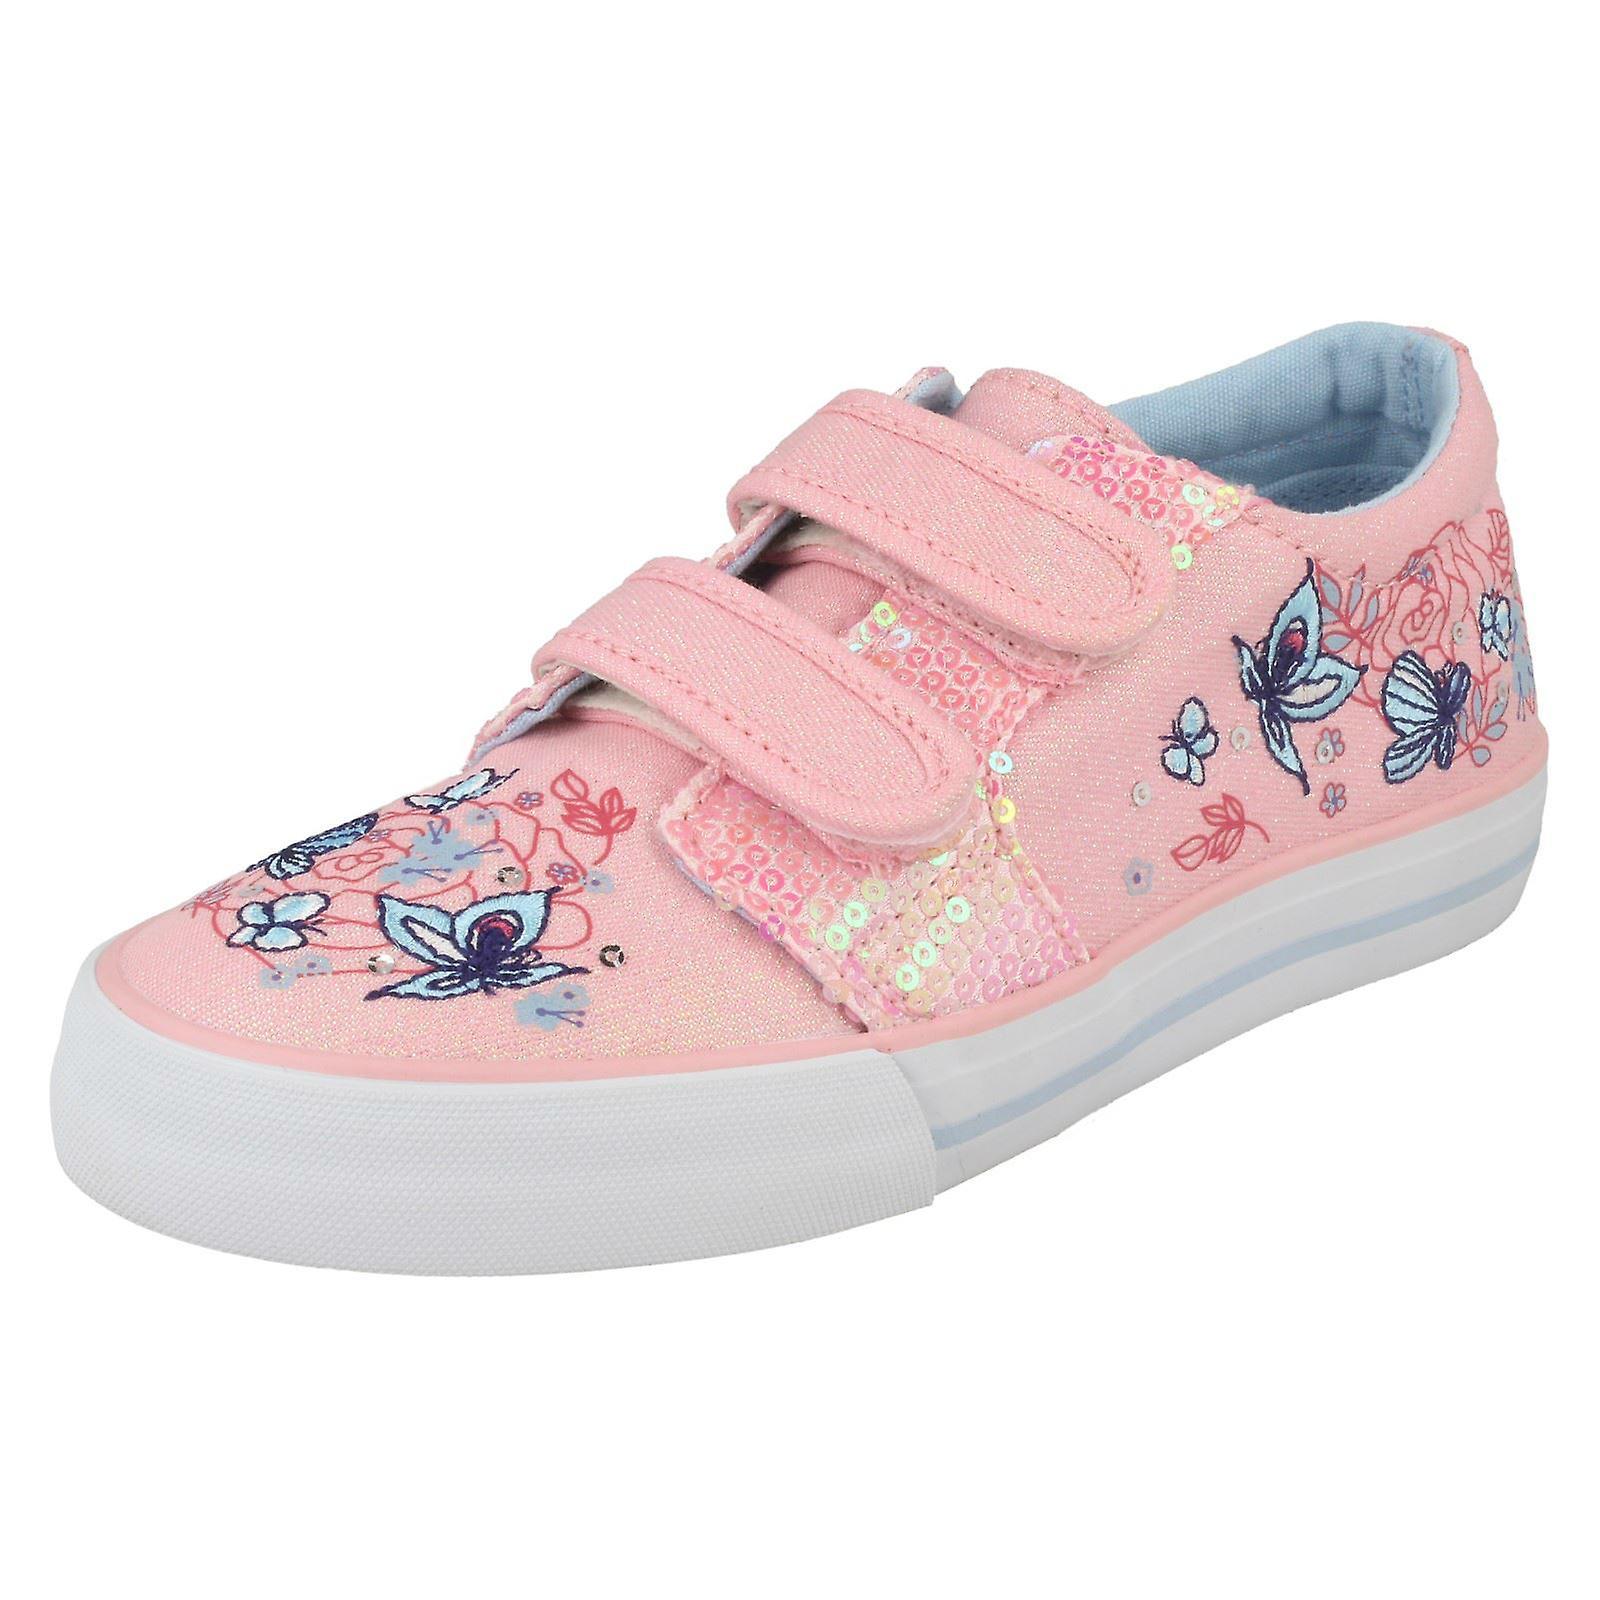 Girls Sorrento Startrite Glittery Canvas Shoes Sorrento Girls fa6a8b